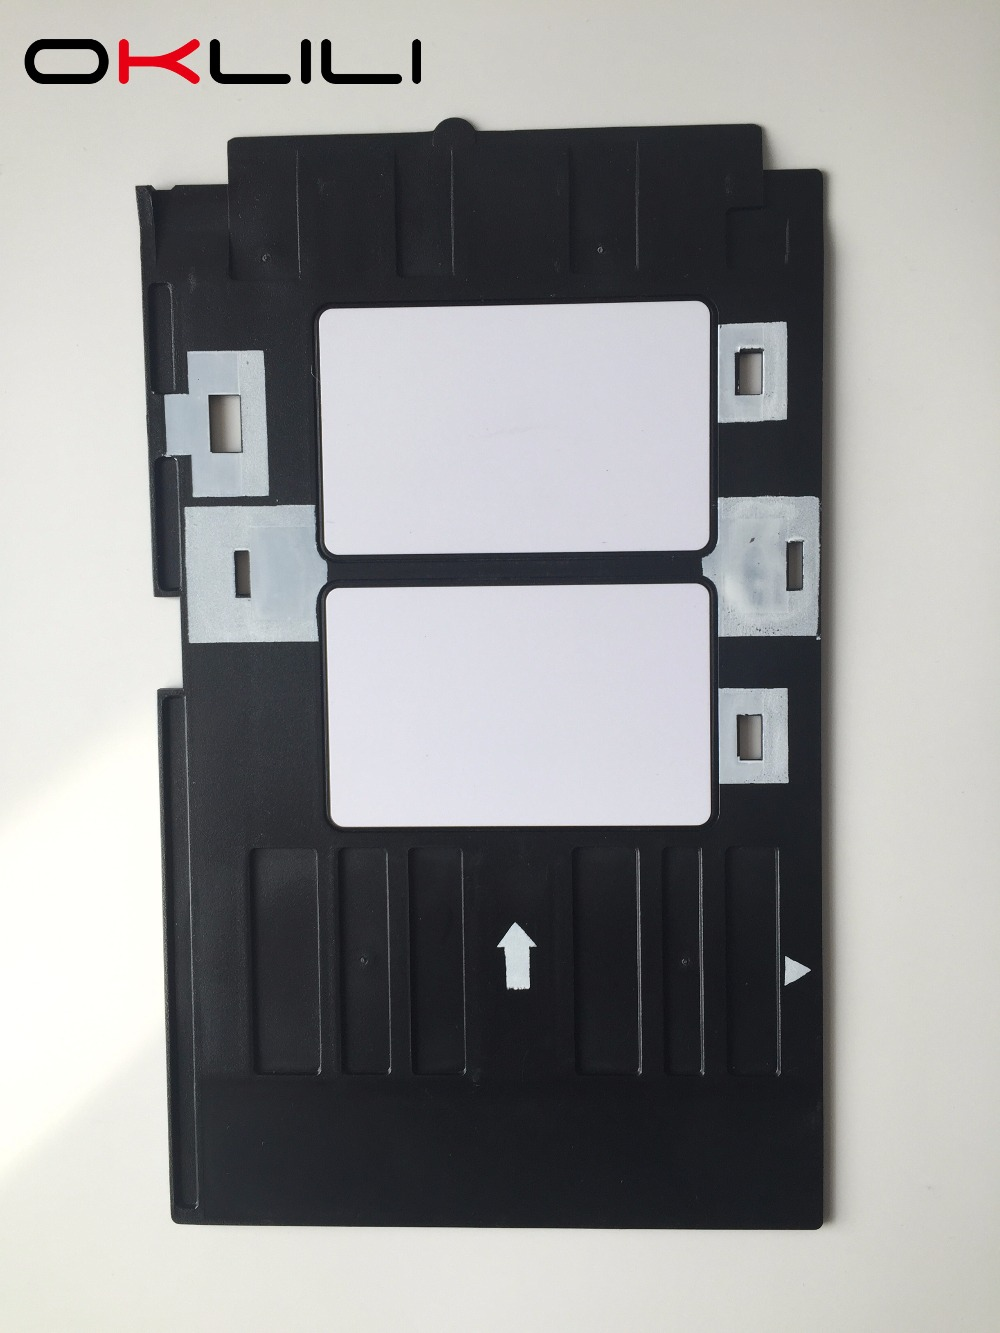 PVC ID Card Tray Kunststoff karte Druck Fach für Epson R260 R265 R270 R280 R290 R380 R390 RX680 T50 T60 a50 P50 L800 L801 R330